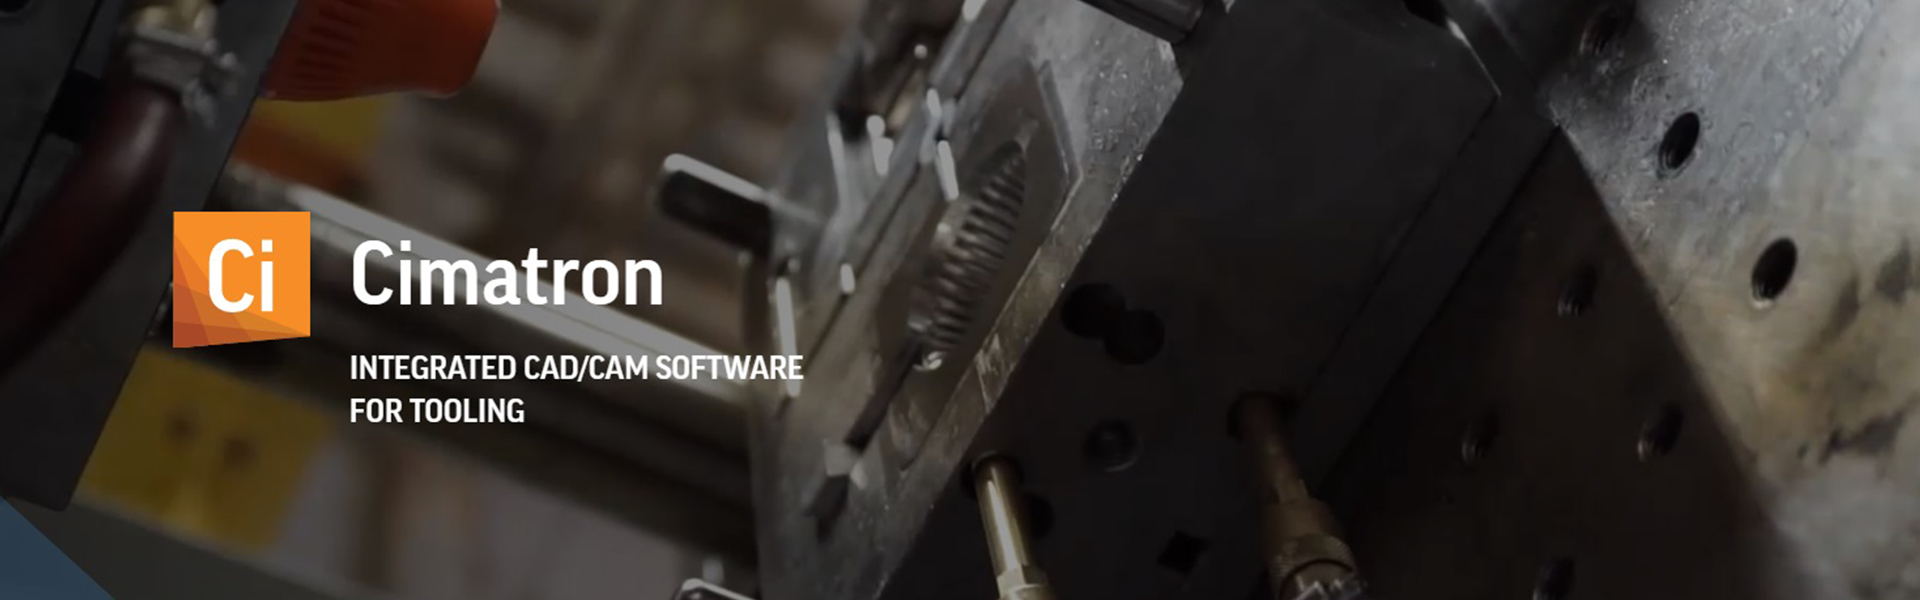 Cimatron software